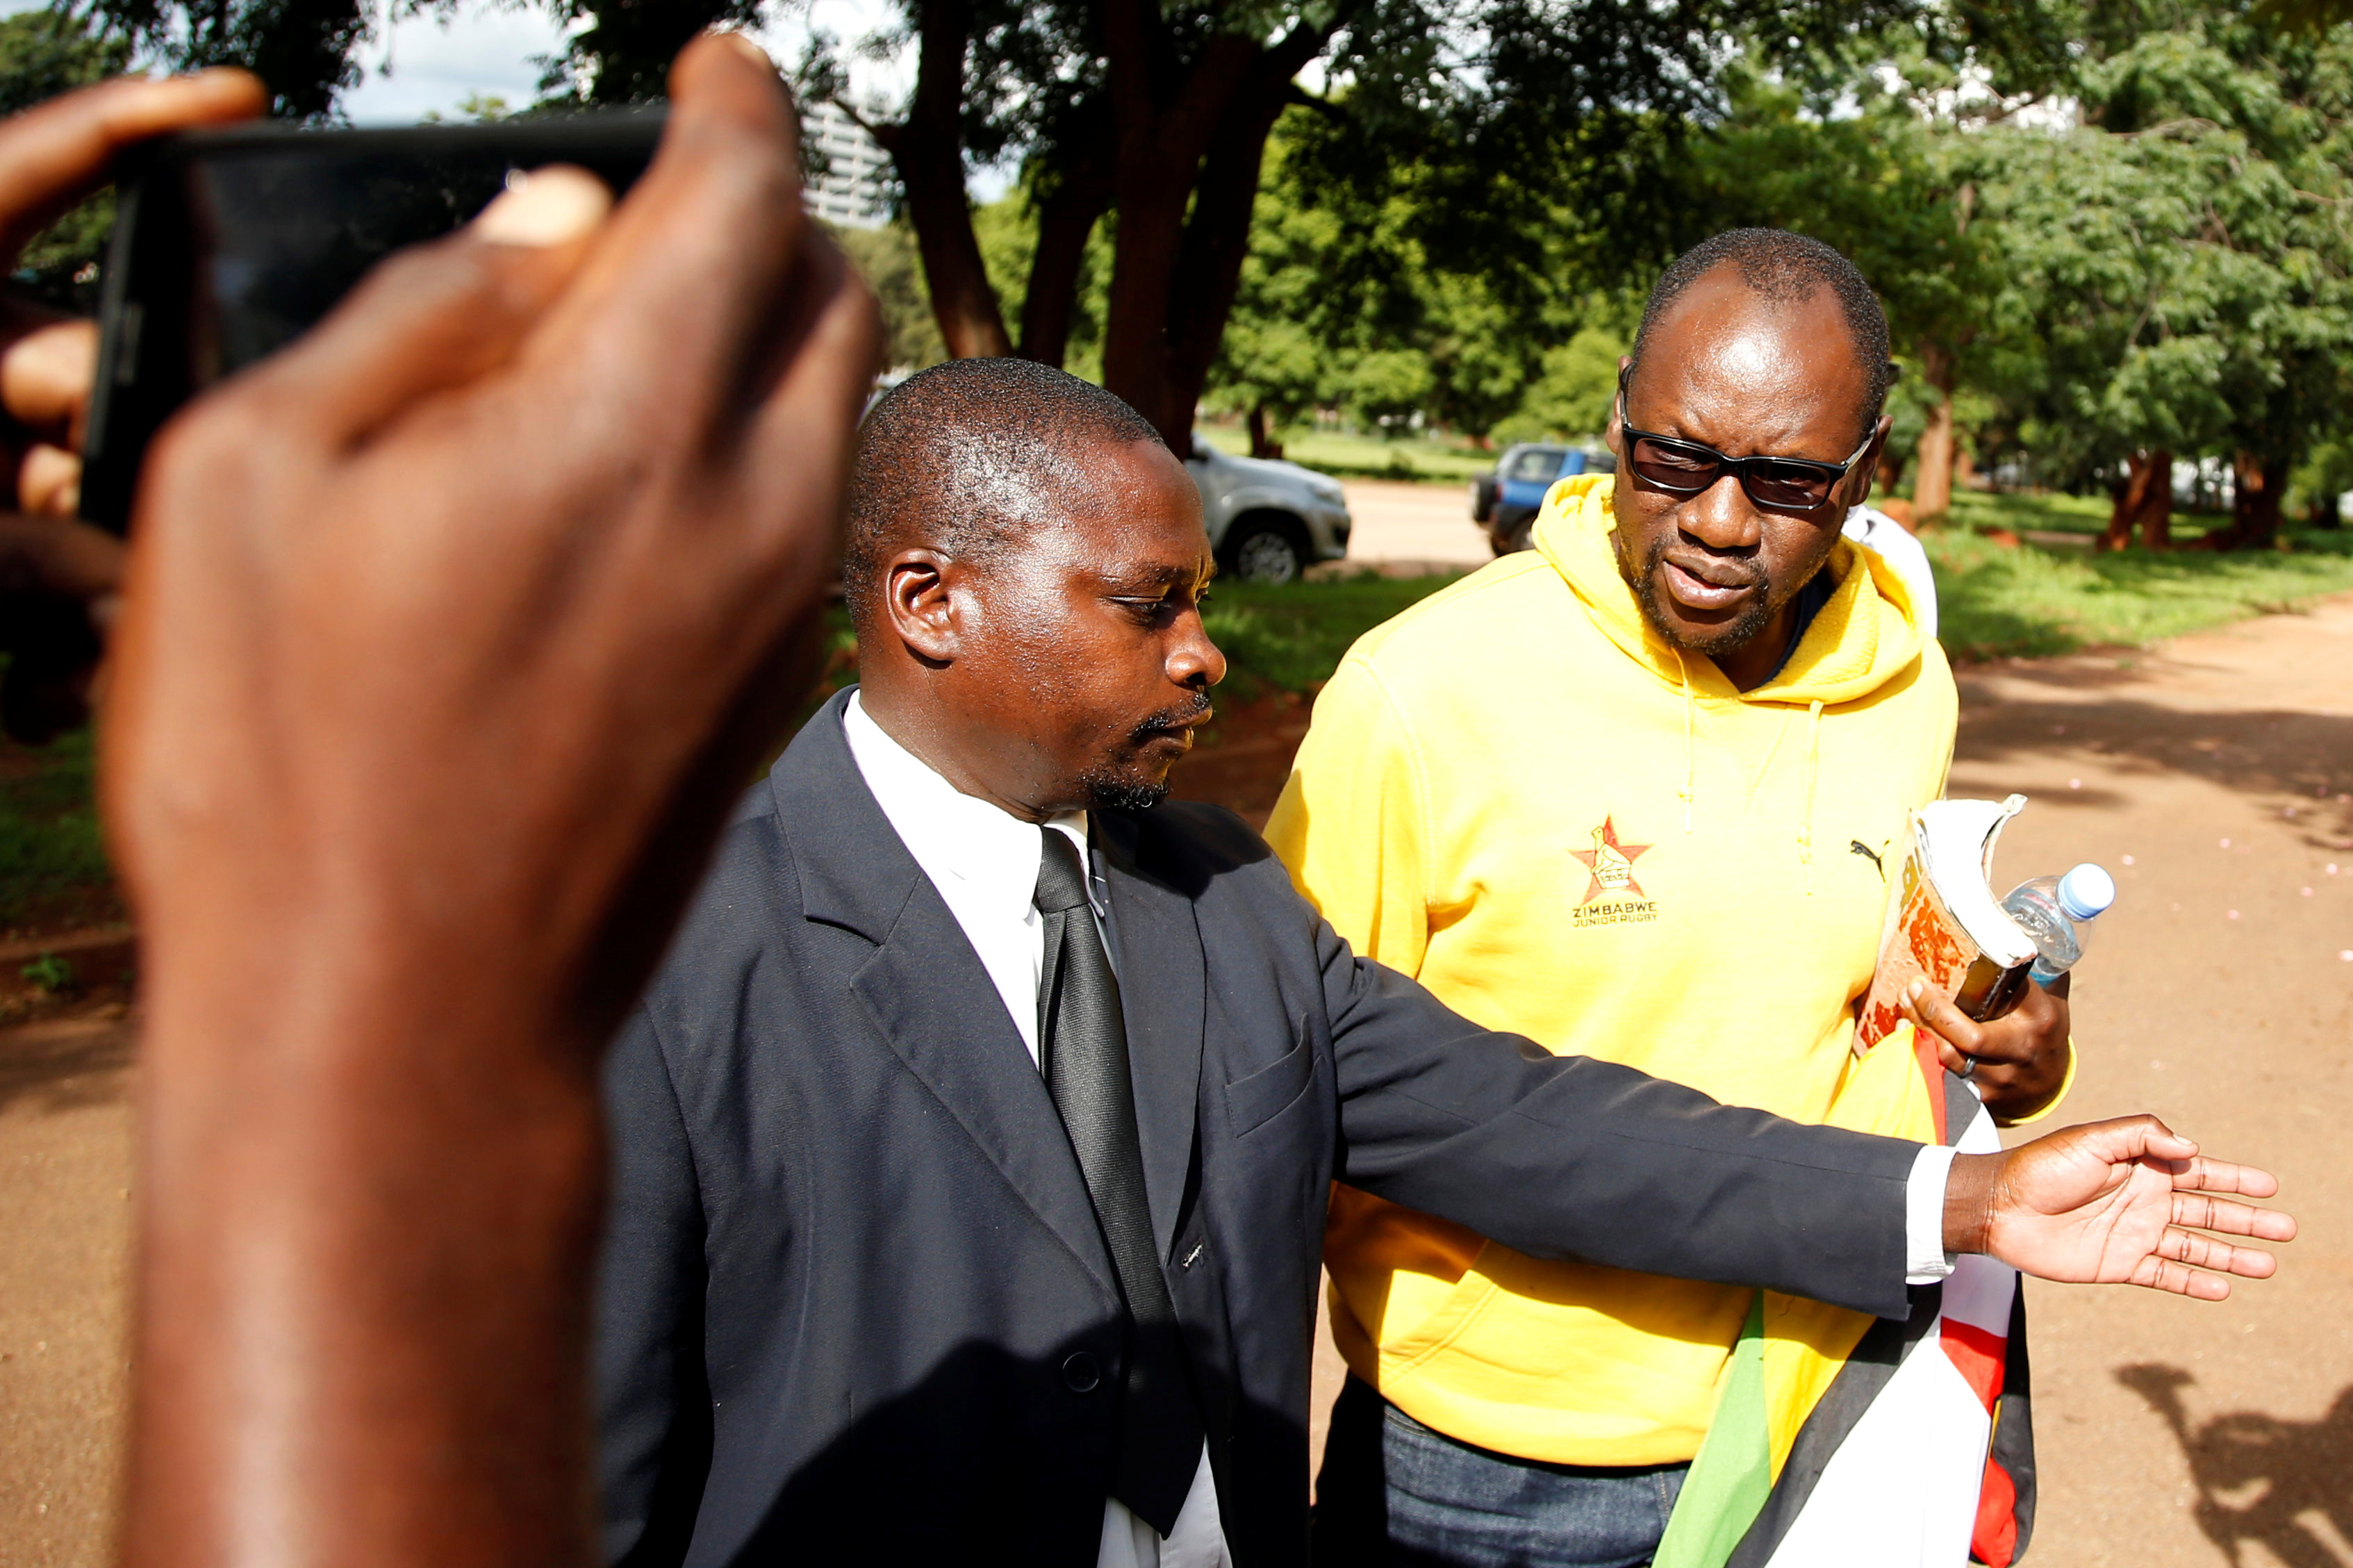 Zimbabwe doctors treat 68 for gunshot wounds, police arrest hundreds